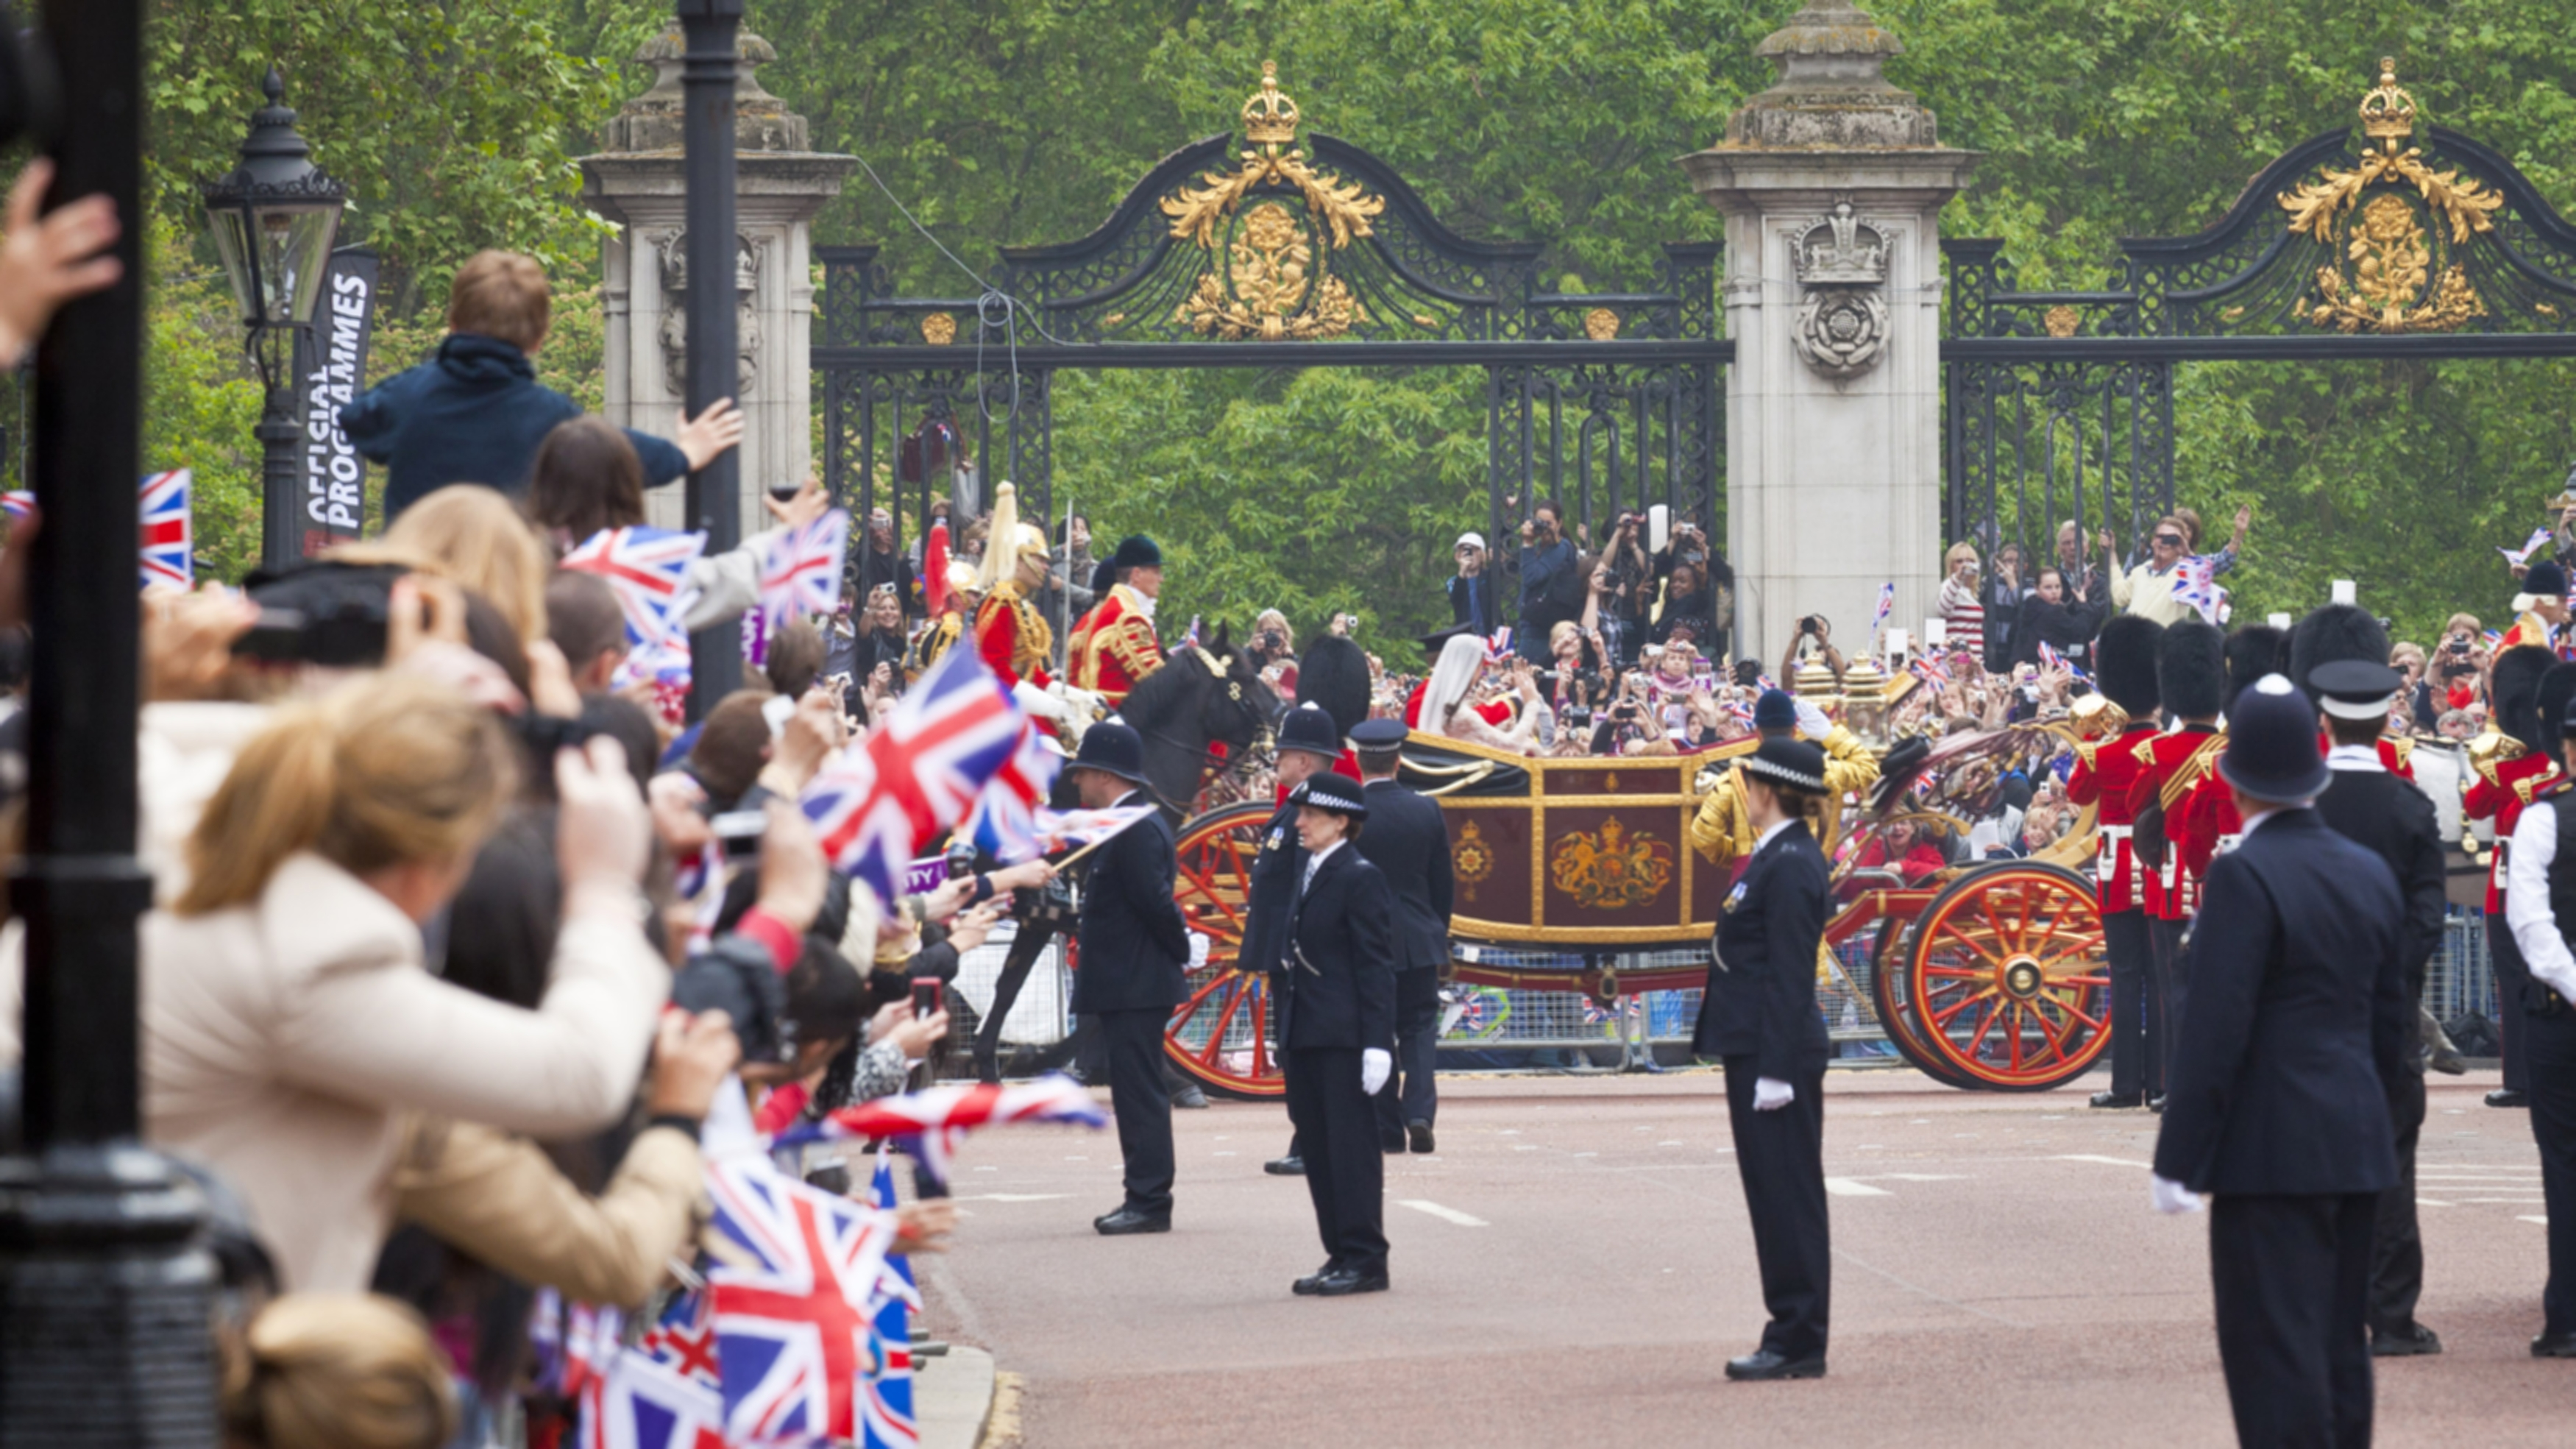 Kate ja prinssi William menivät naimisiin 11. huhtikuuta 2011.